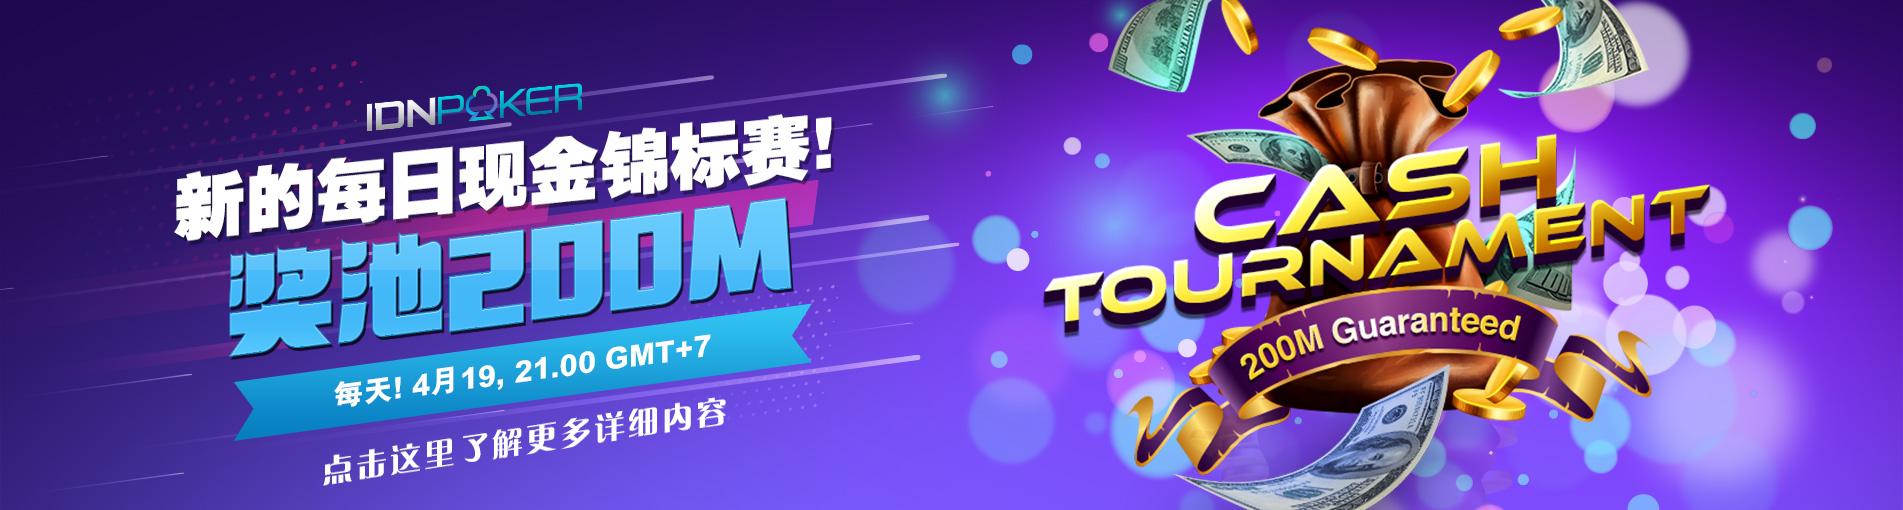 200M CASH TOURNAMENT